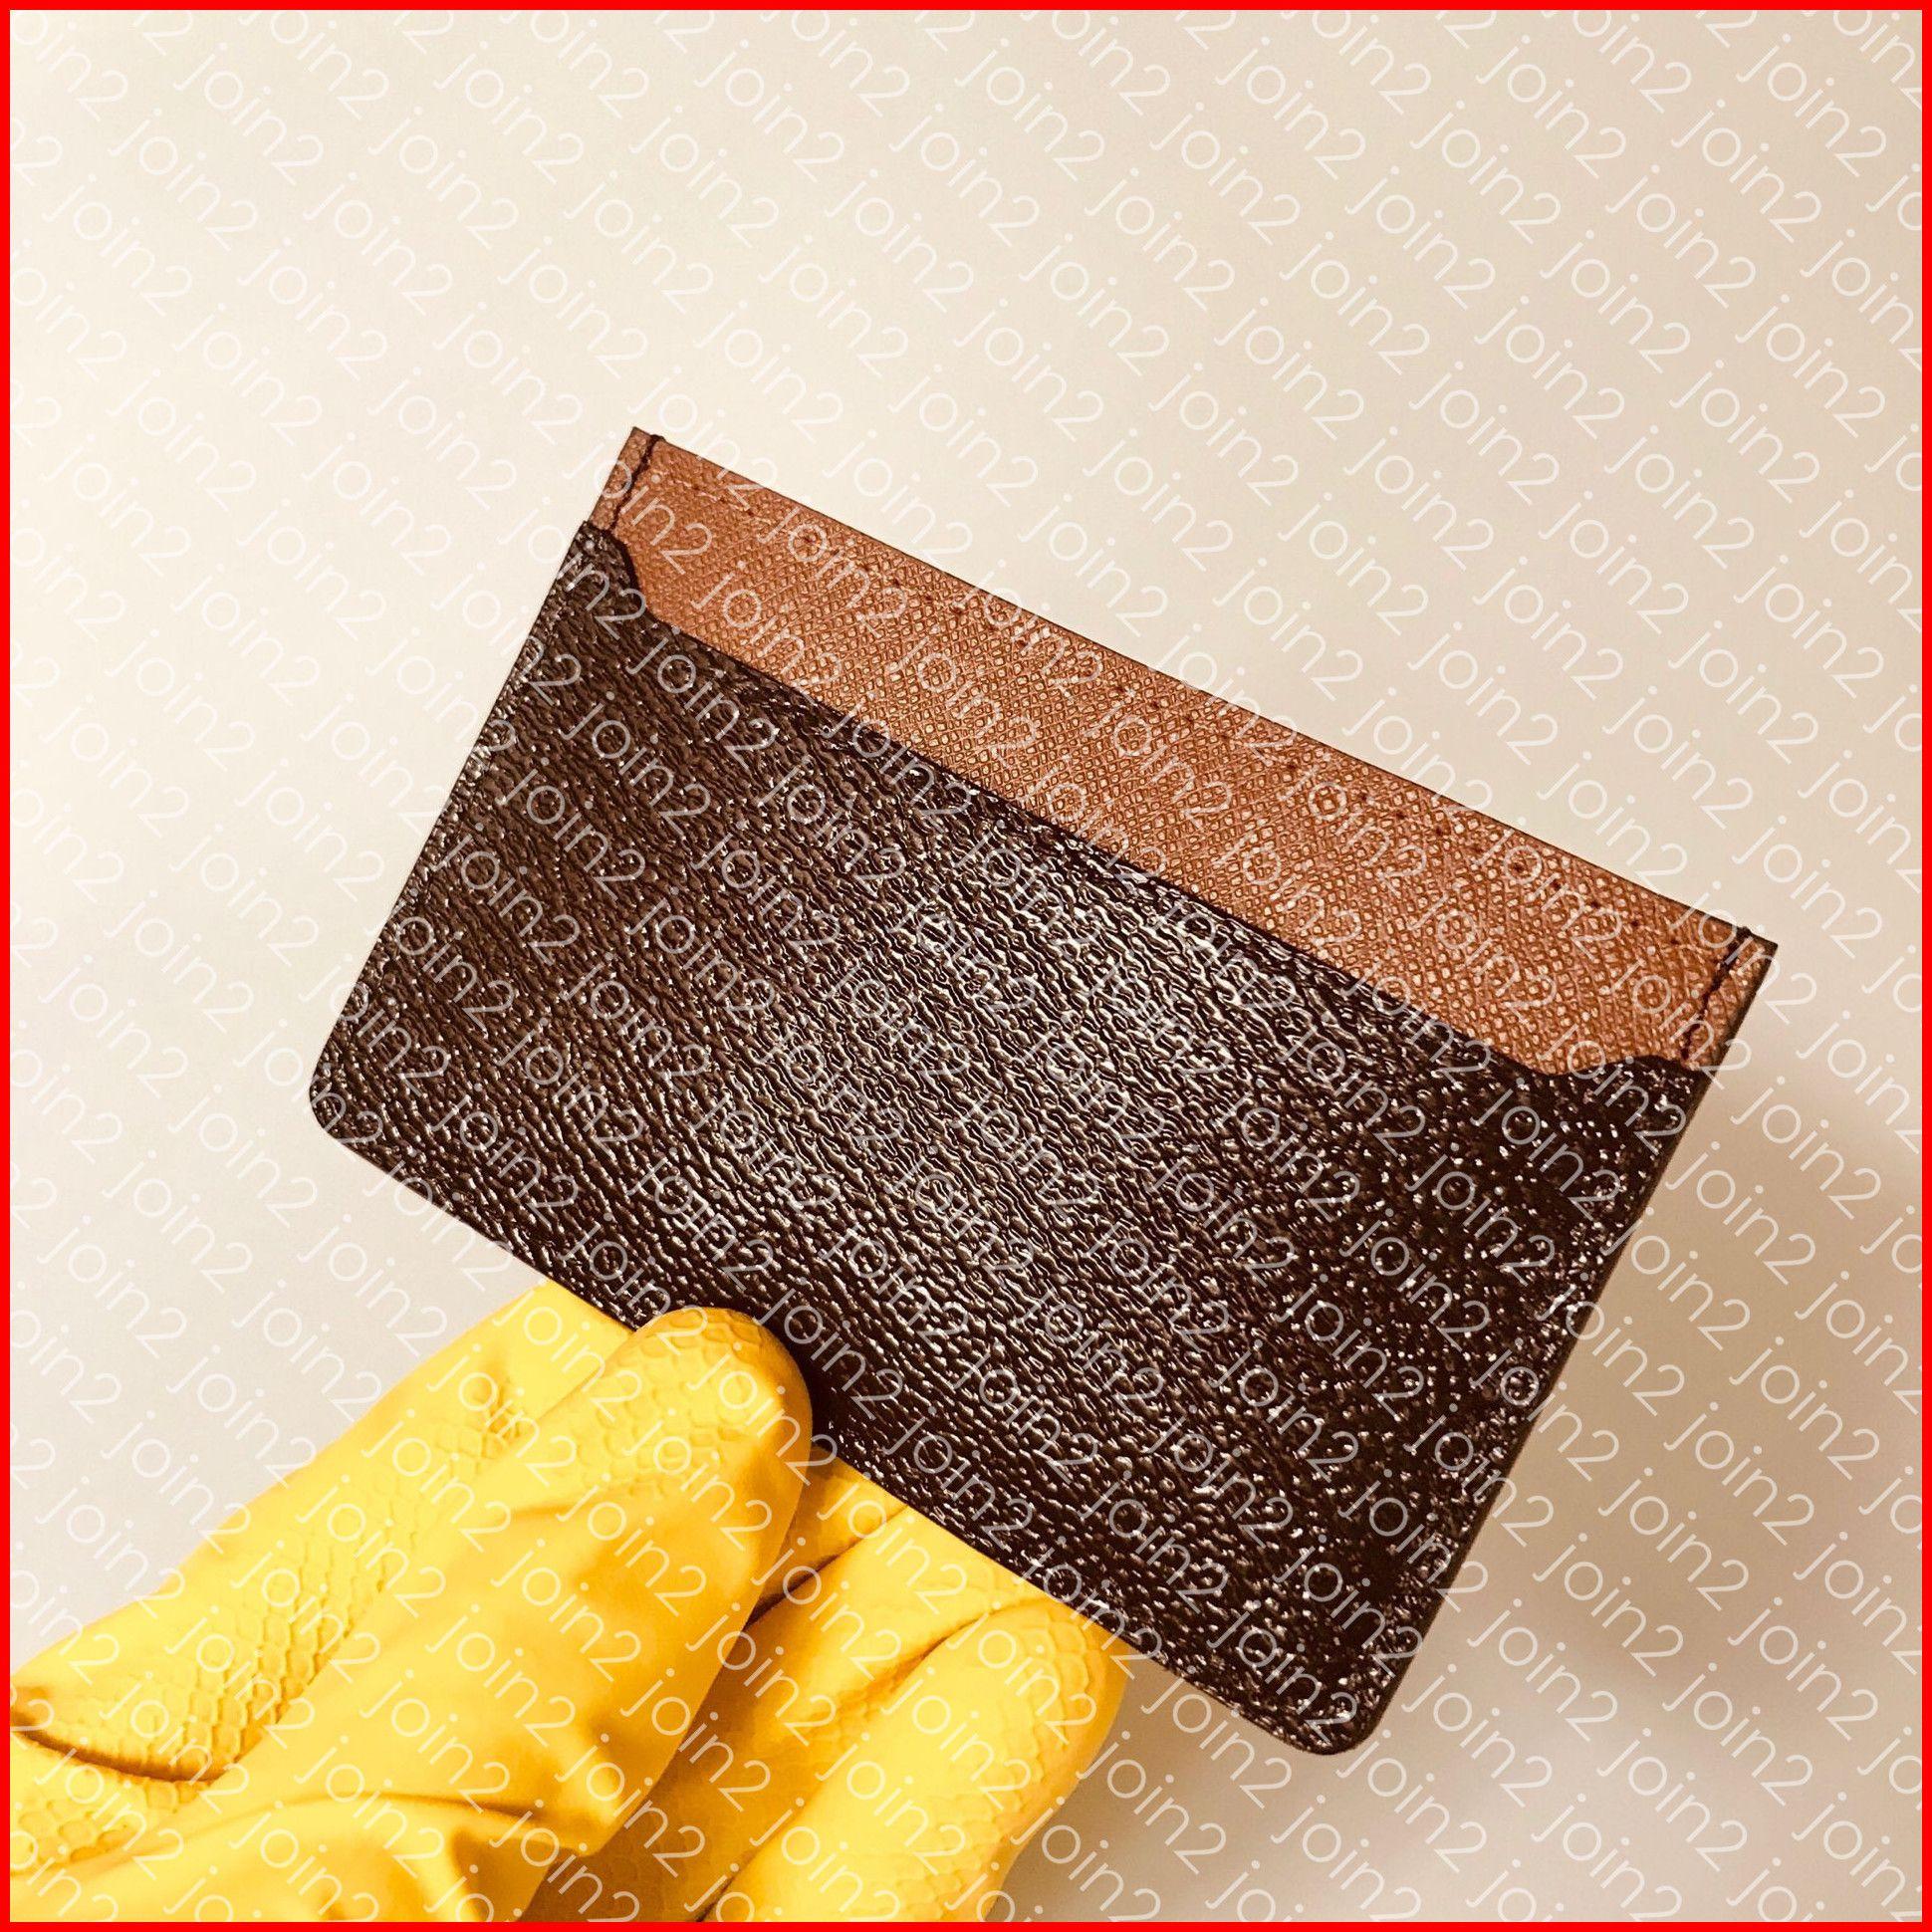 NEO PORTE CARTES N62666 Designer Fashion Mens Wallet 4 6 Key Credit Coin Card Holder Case Pocket Organizer Key Pouch Pochette Cle Double